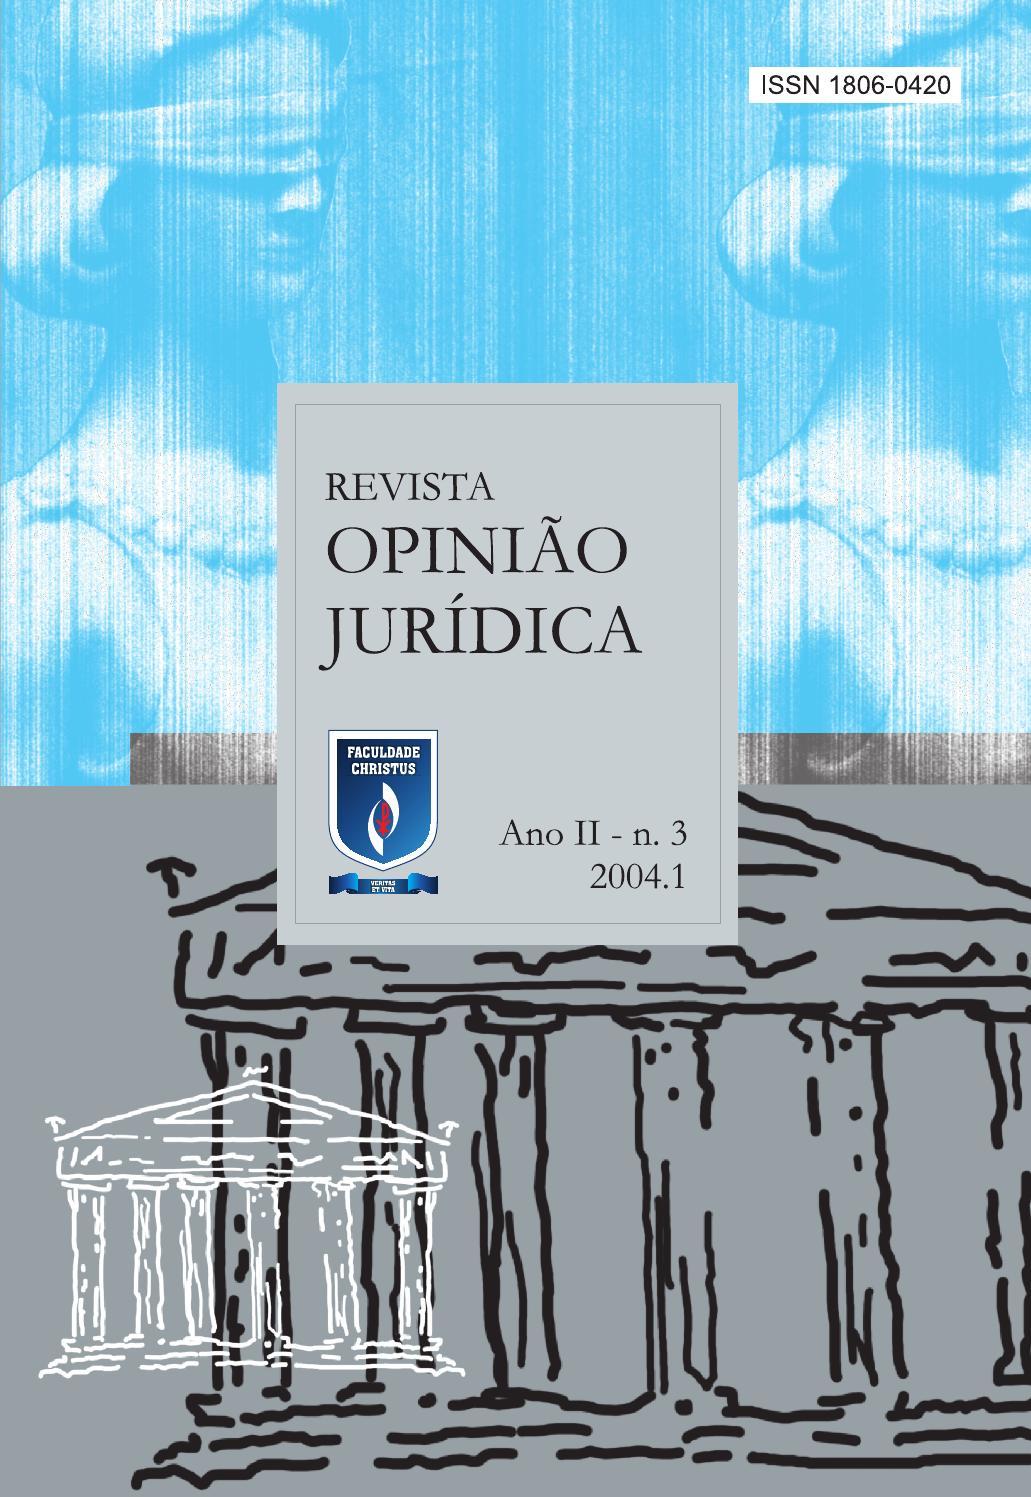 Revista opinio jurdica 03 by unichristus issuu fandeluxe Image collections